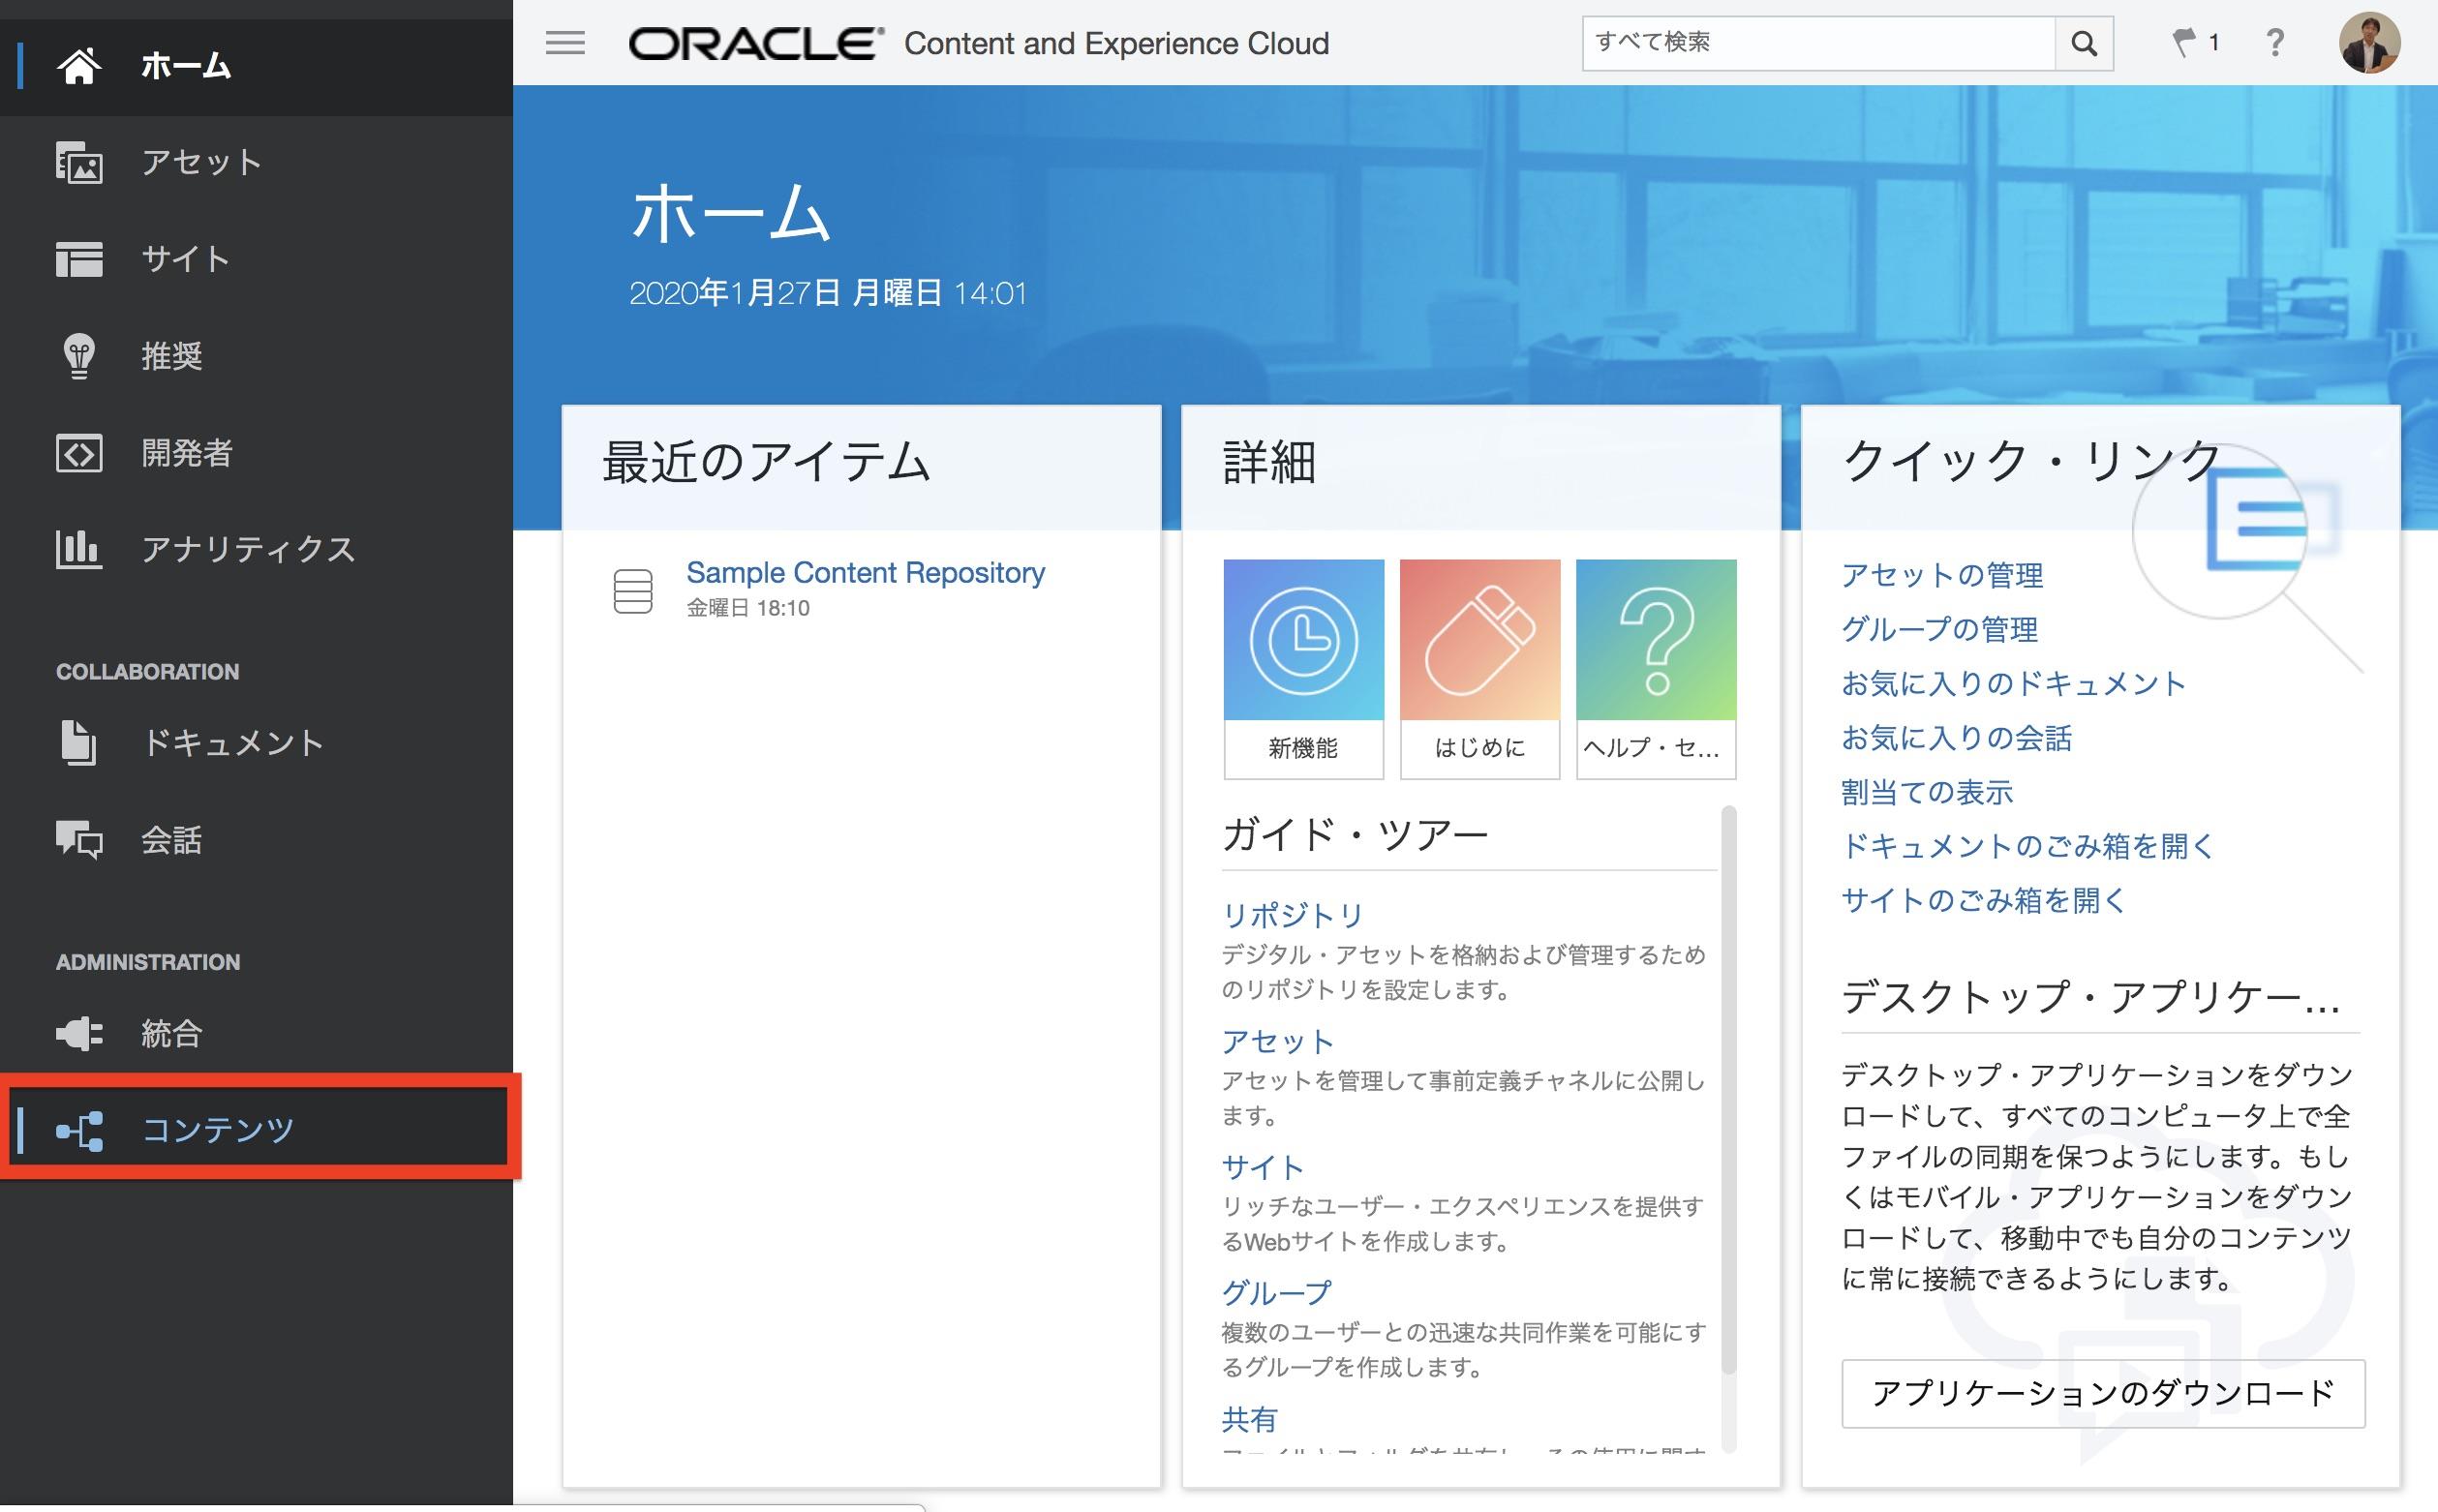 oce_image3.jpg